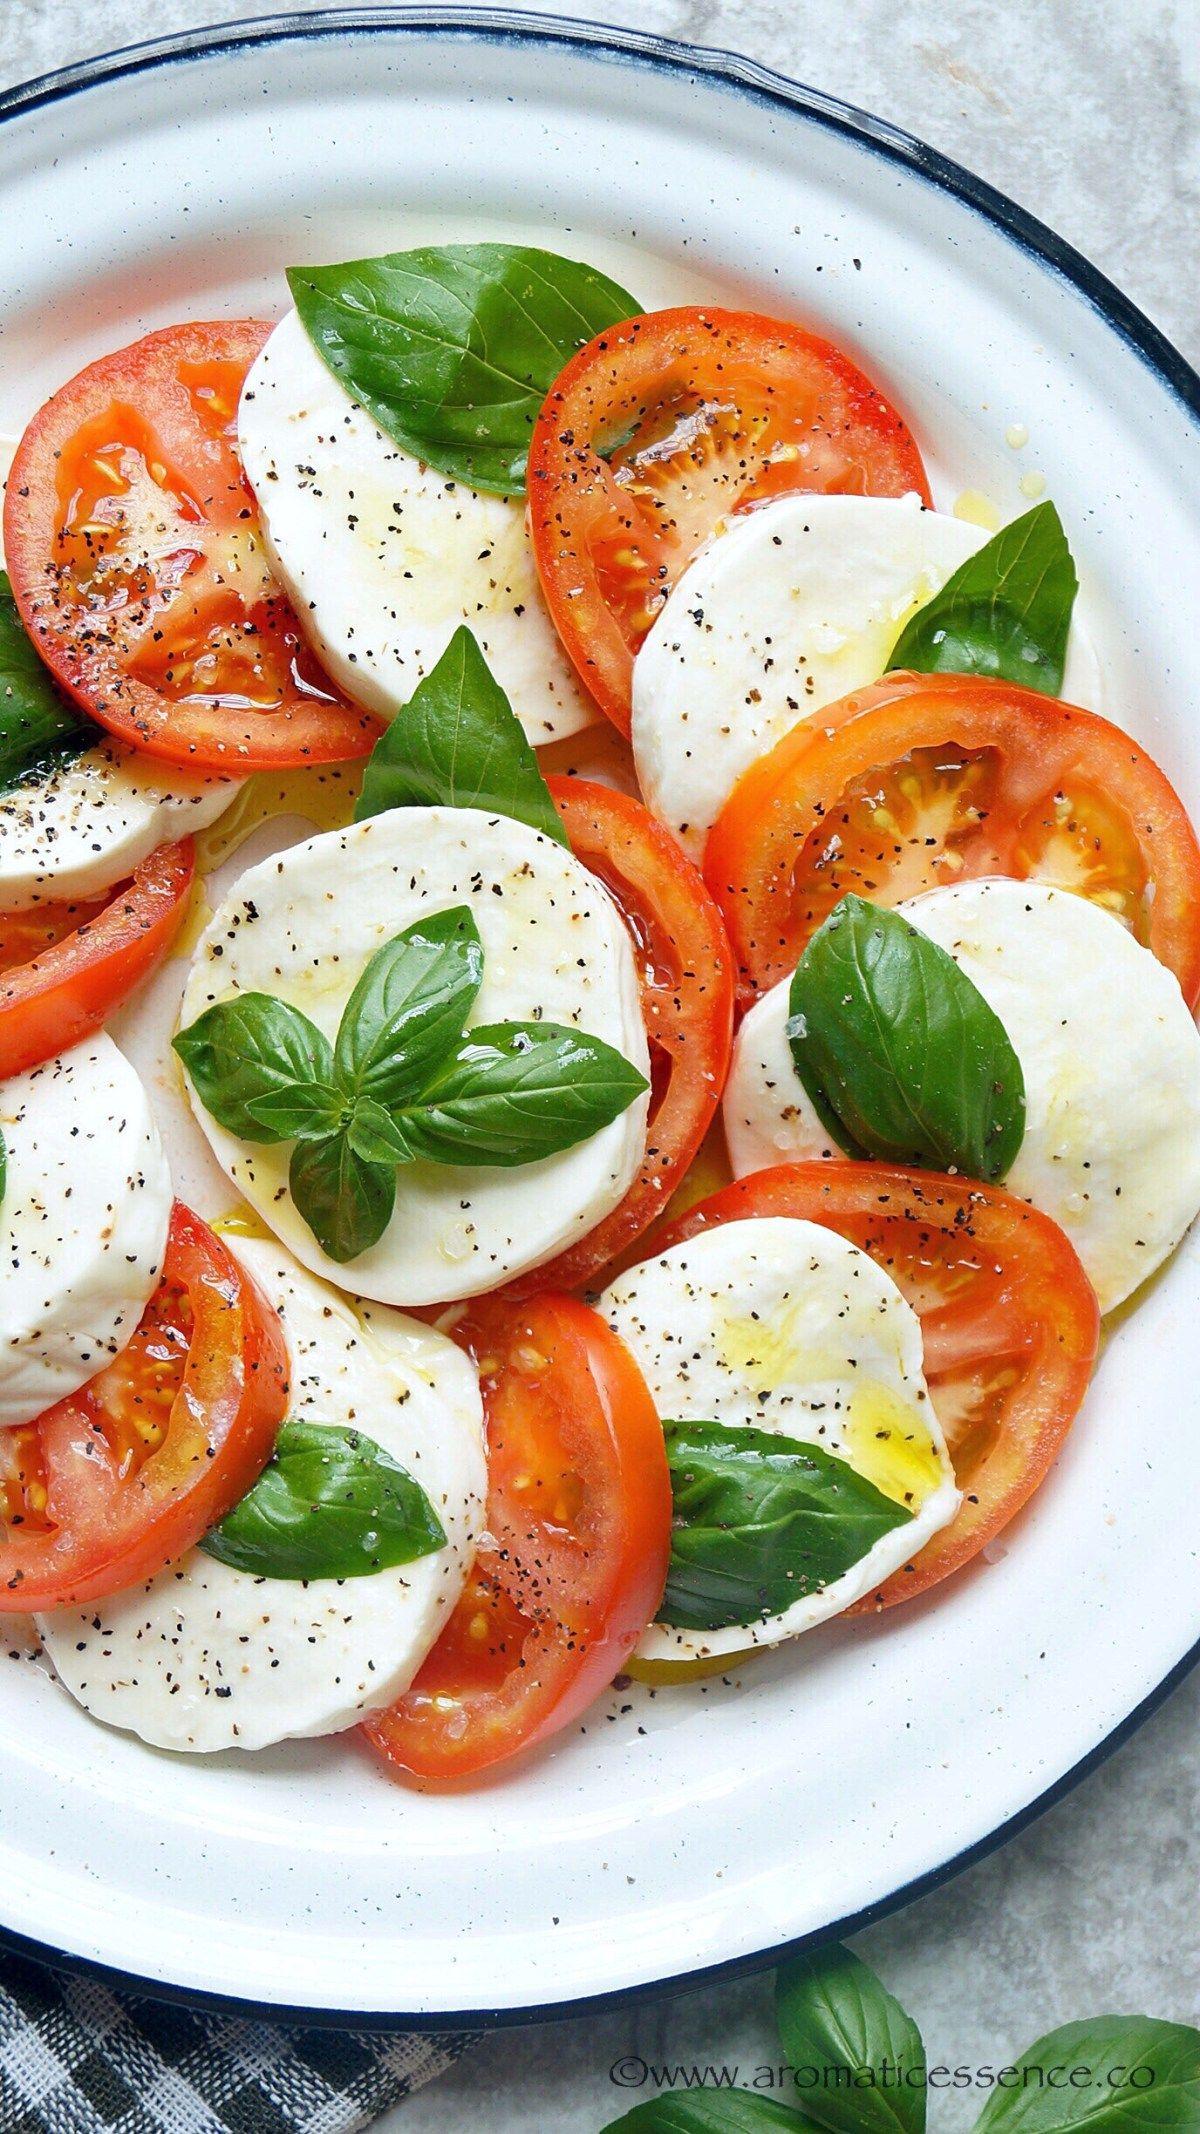 Photo of Caprese Salad | Italian Salad With Mozzarella, Tomatoes & Basil